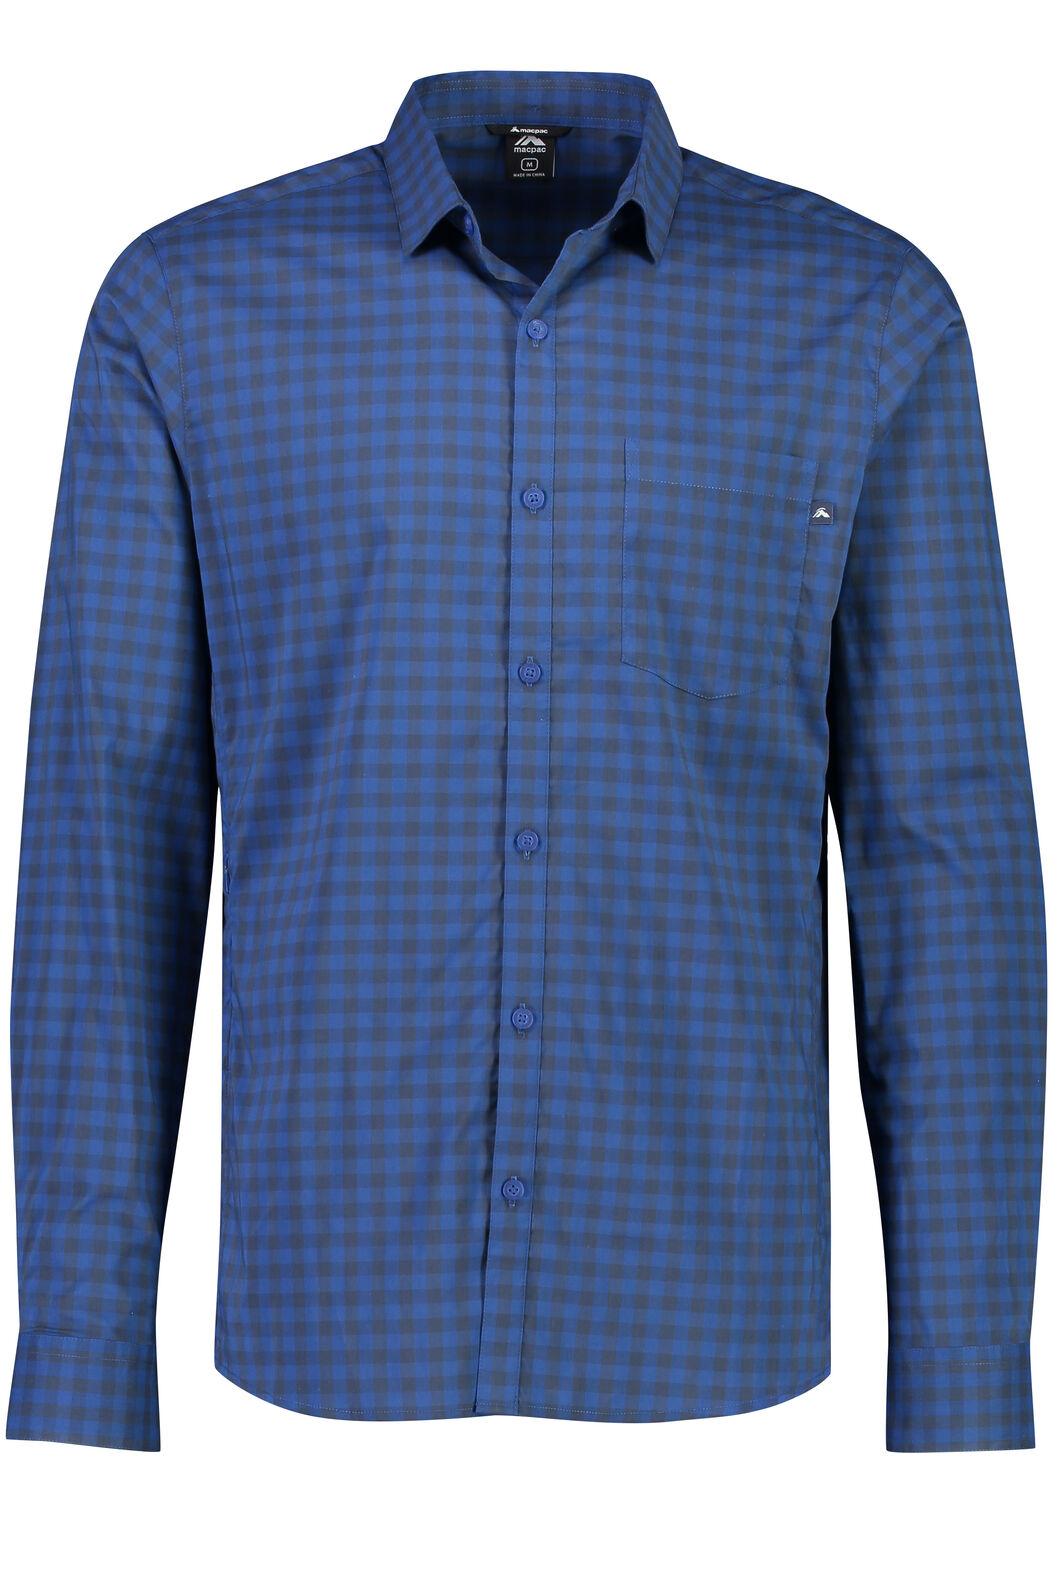 Crossroad Long Sleeve Shirt - Men's, Black Iris, hi-res